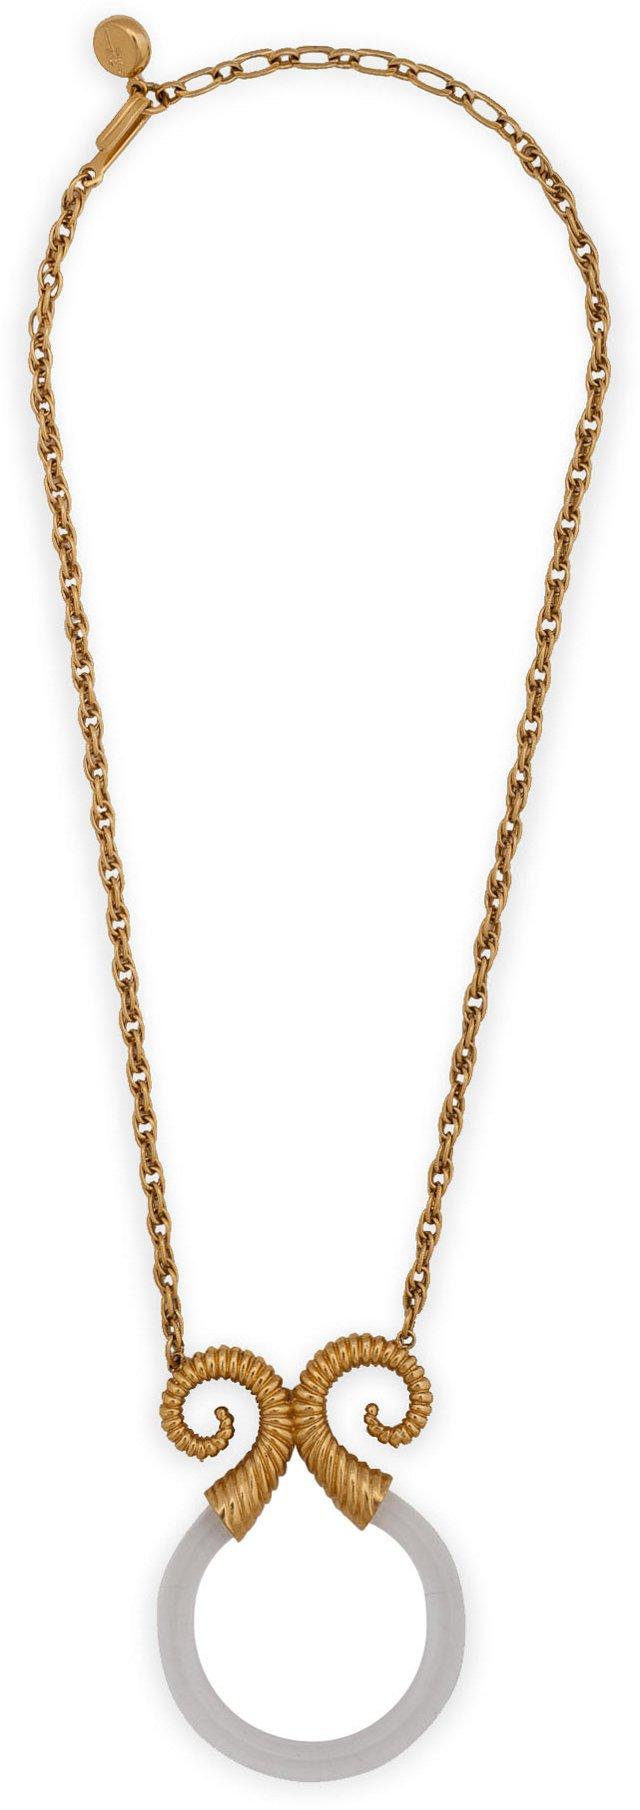 Crown Trifari Lucite Necklace